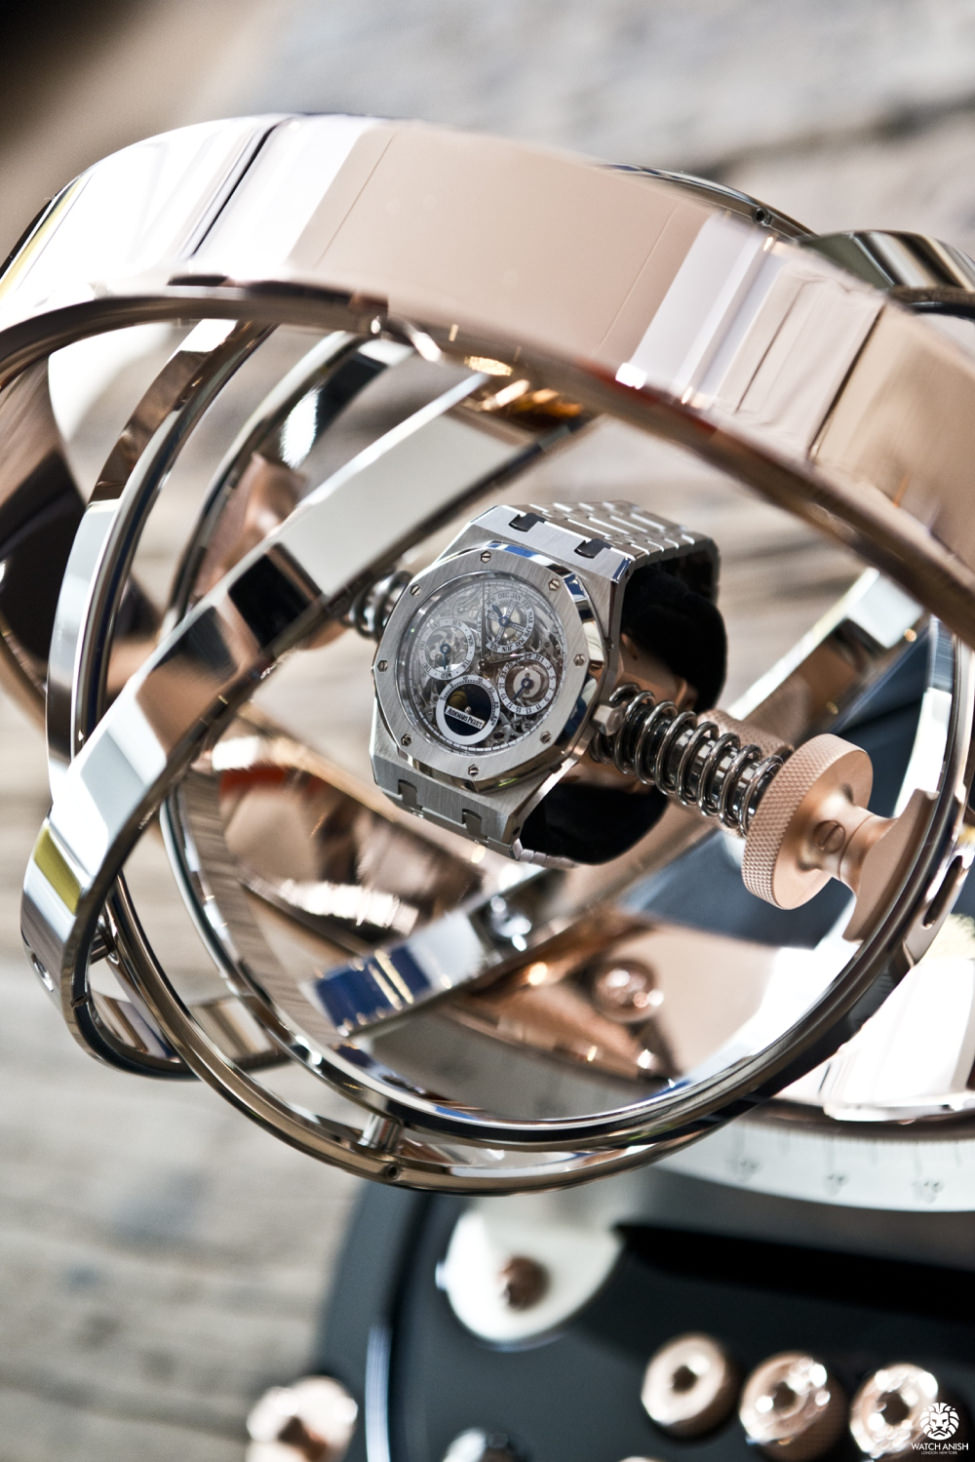 watch macro equipment technology chrome steel machinery instrument